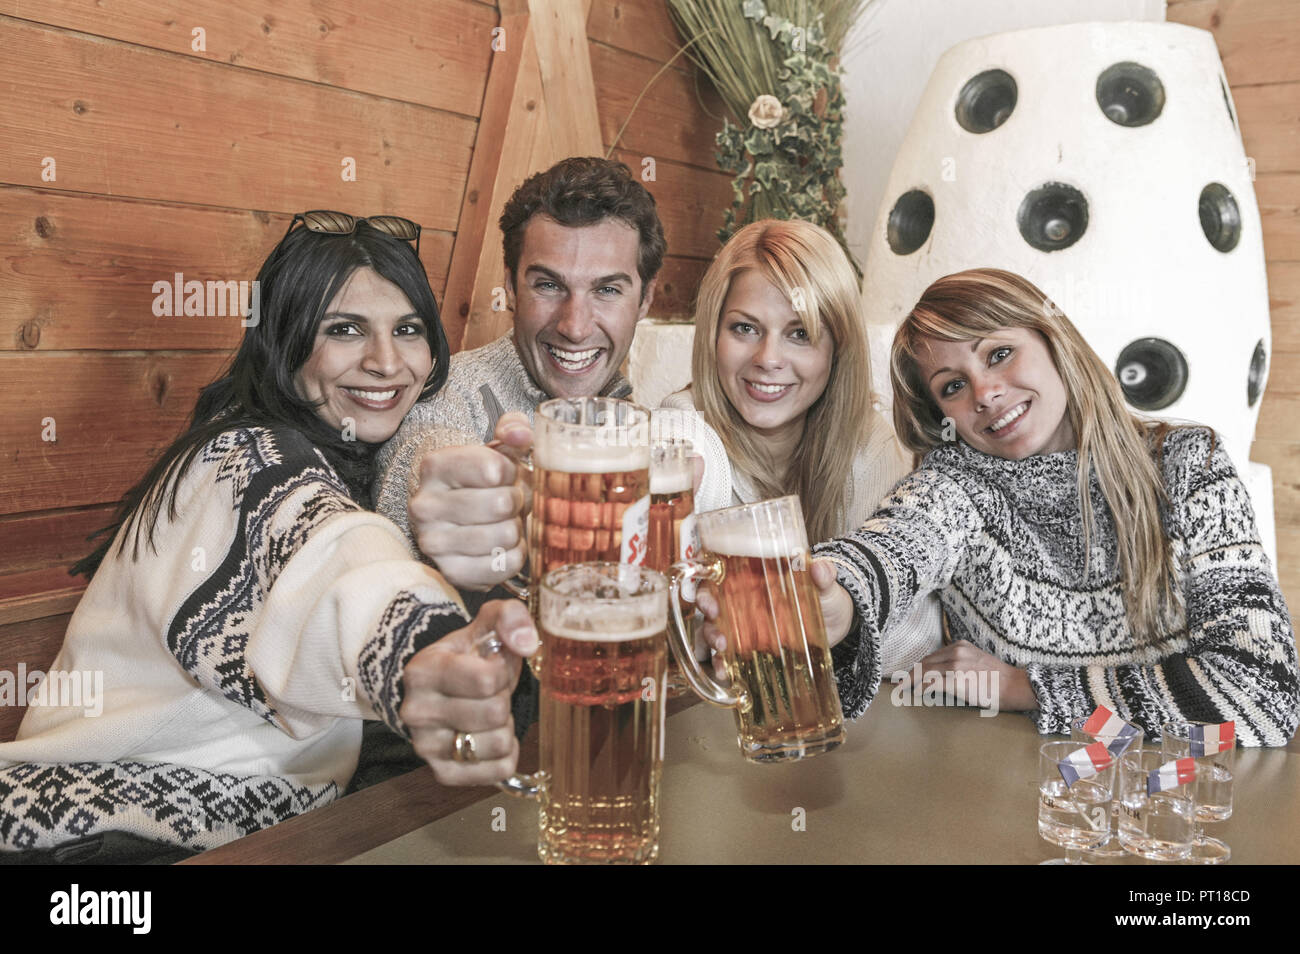 young people celebrating apres ski at ski hut (model-released) - Stock Image